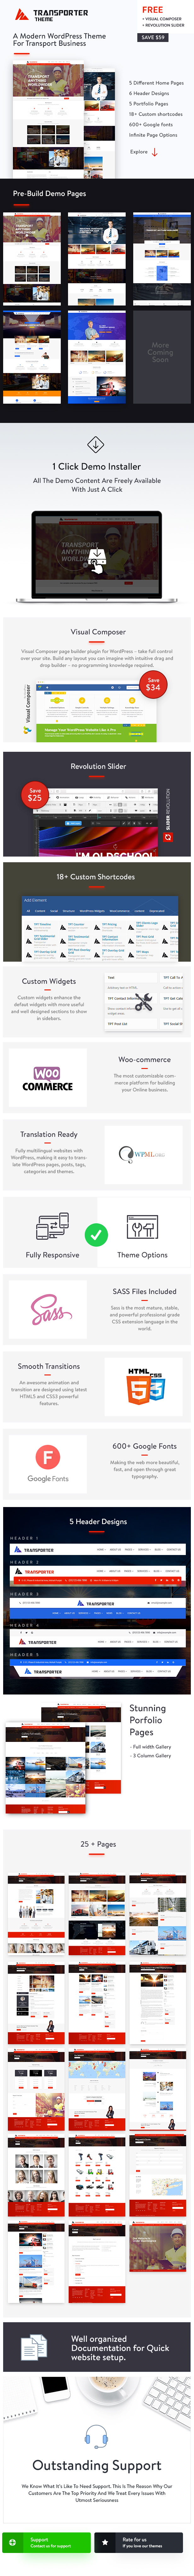 Transporter   Transportation & Logistics WordPress Theme - 1